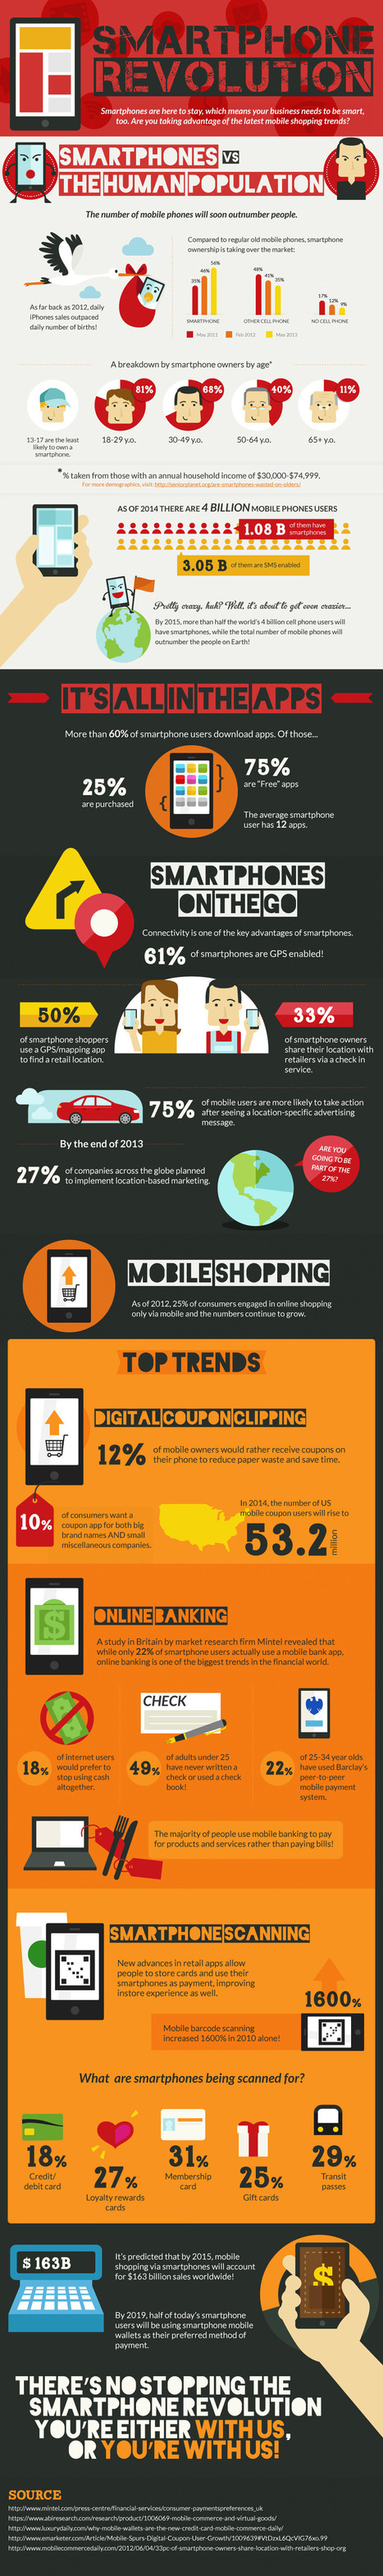 Smartphones are Changing the Marketing Landscape | Etudes sur l'e-commerce - Research about e-business | Scoop.it